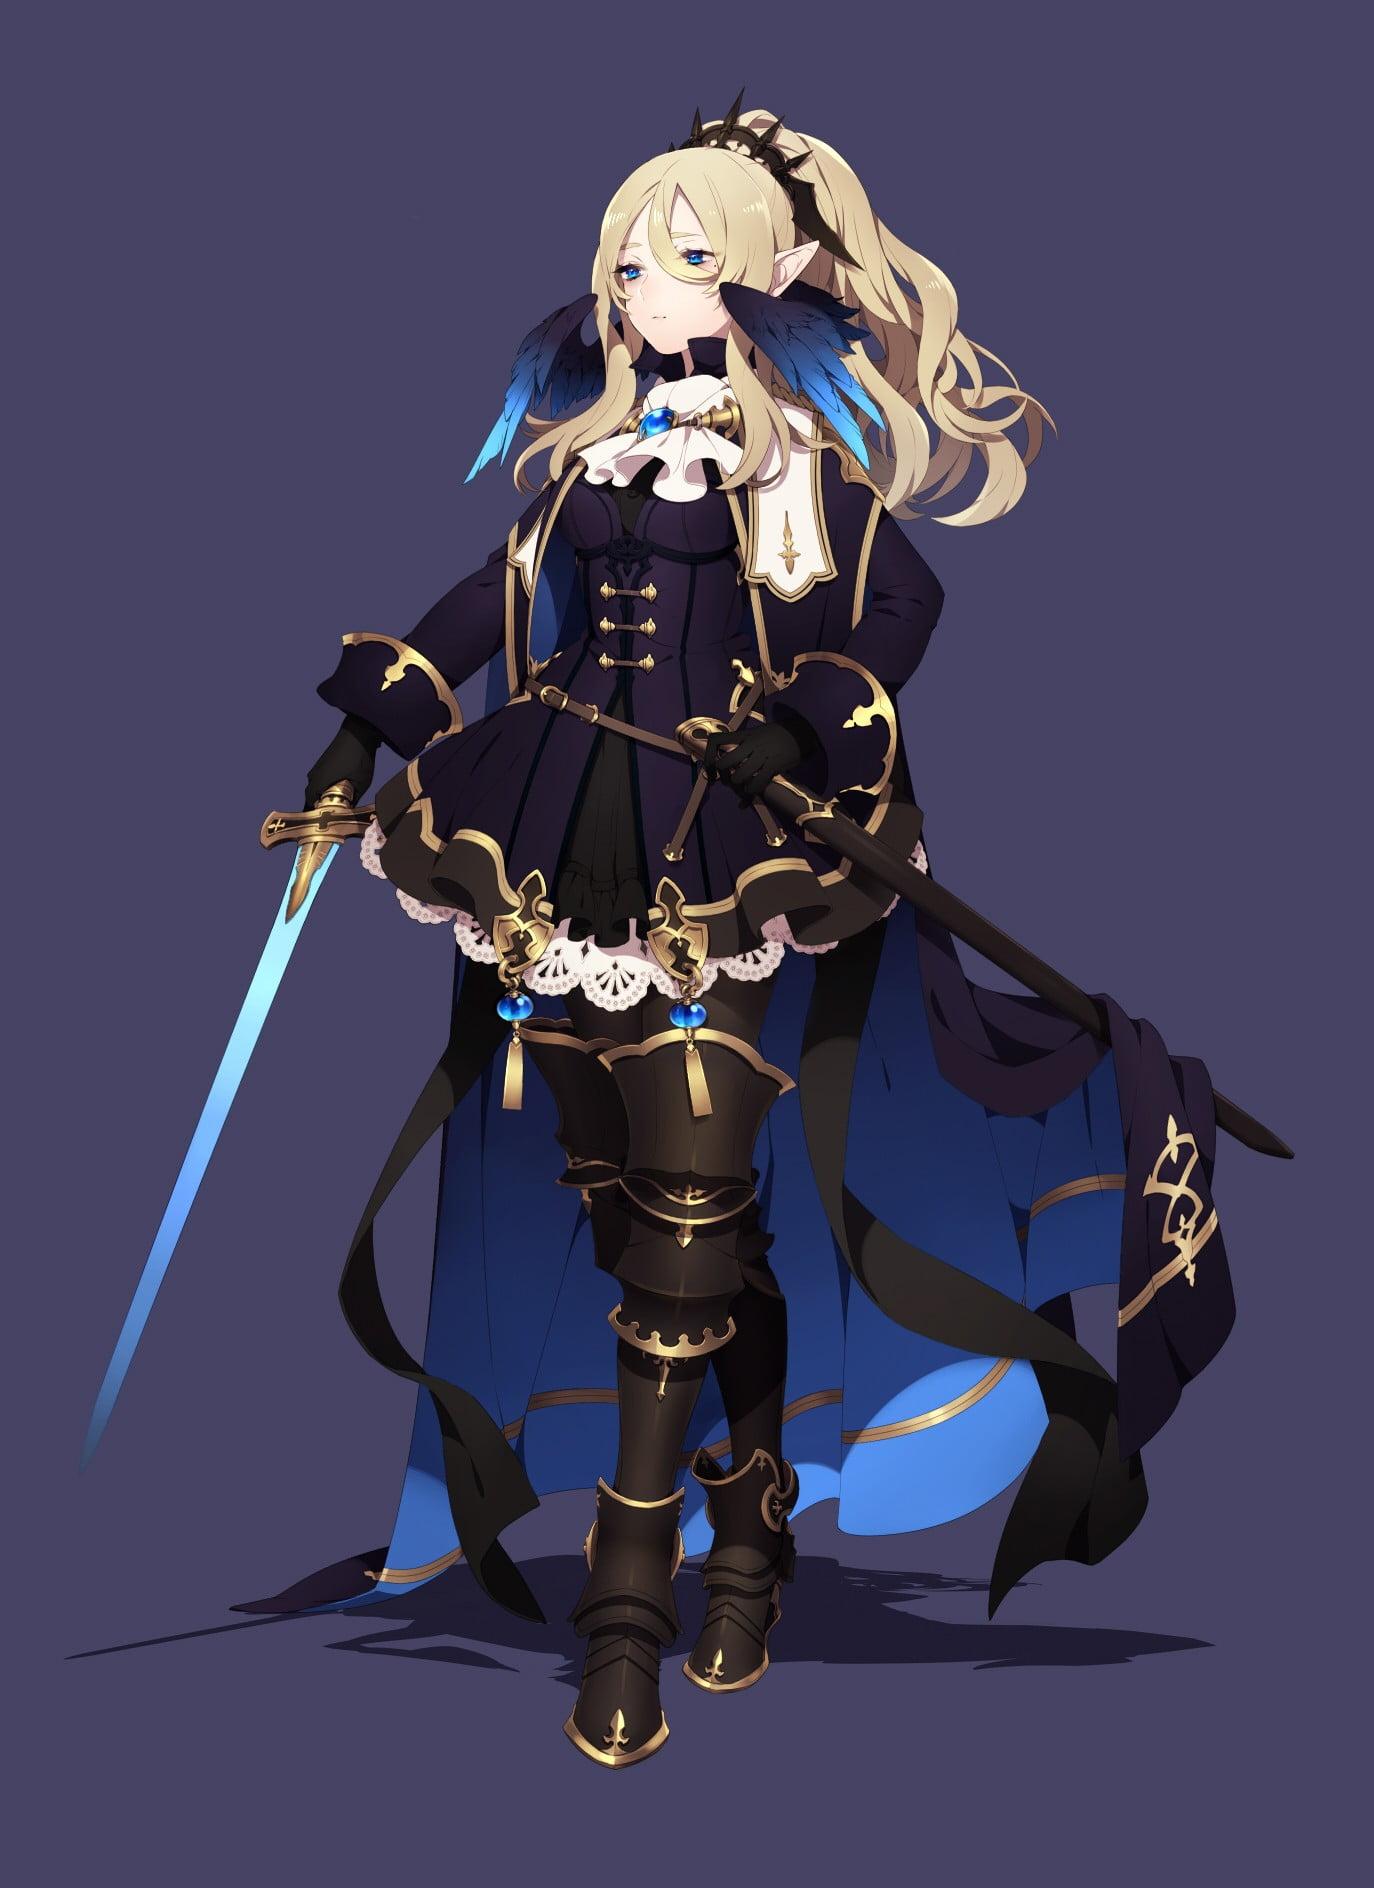 girl armor knight Anime